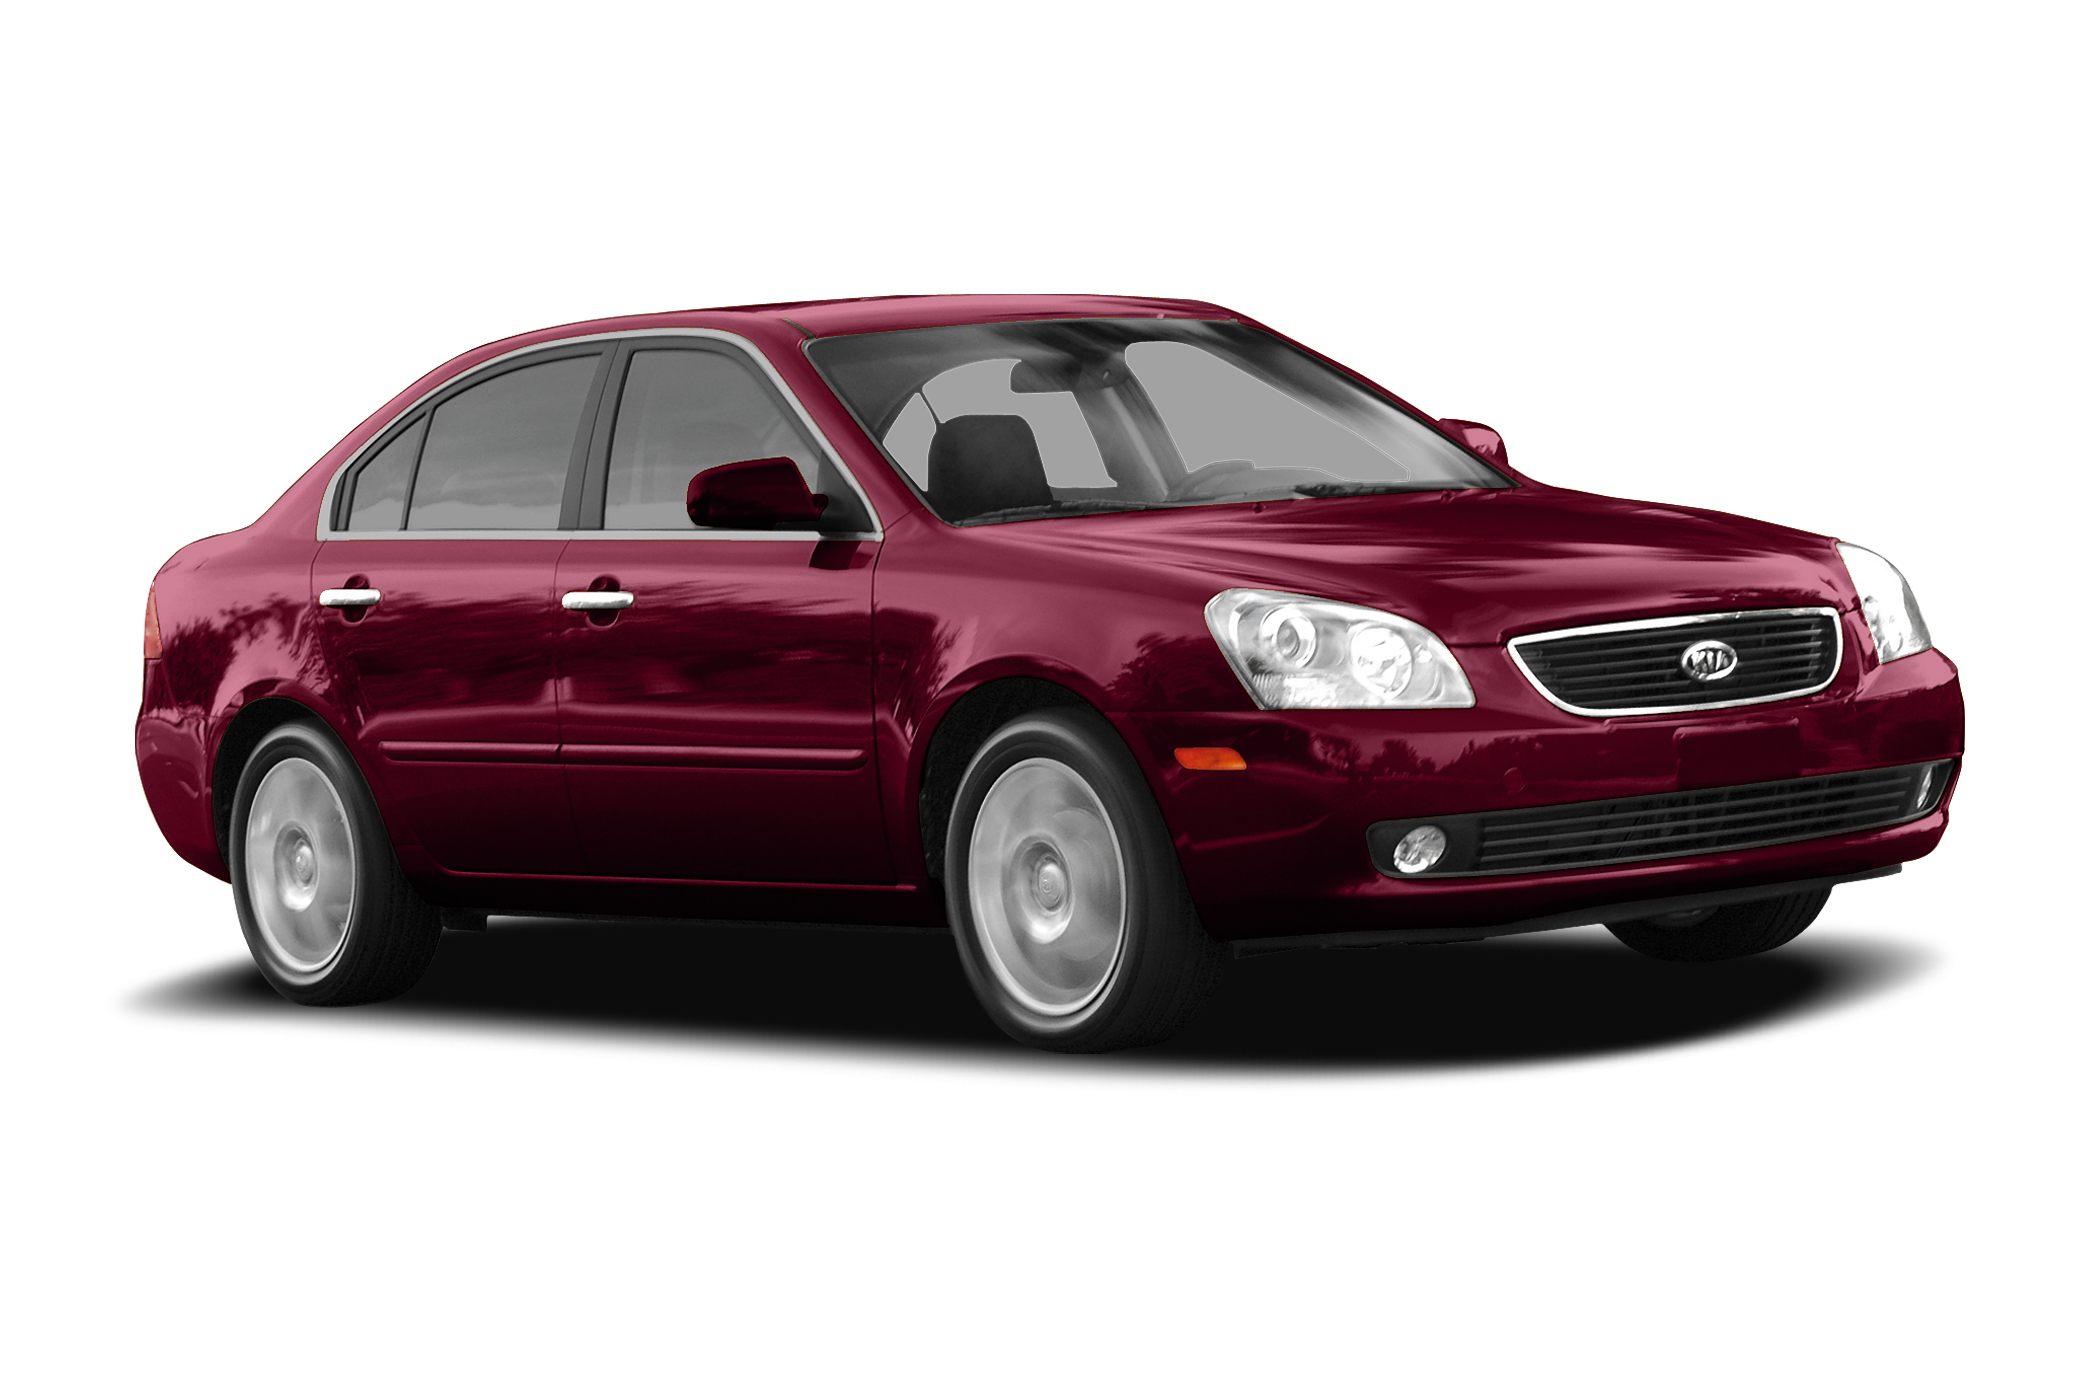 2008 Kia Optima Pricing And Specs